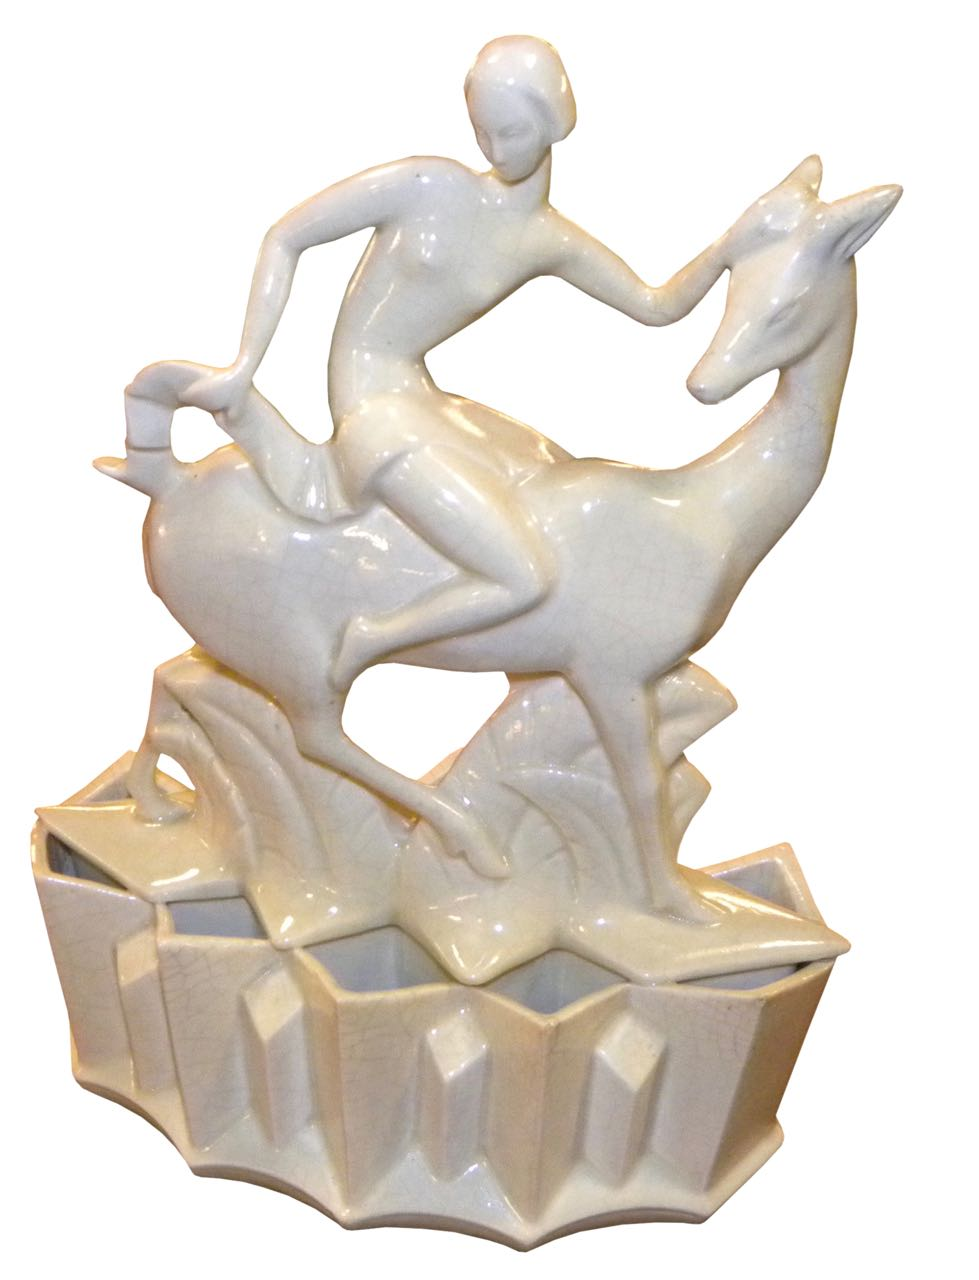 Crackle Glazed Ceramic Art Deco Woman on Antelope Cubist